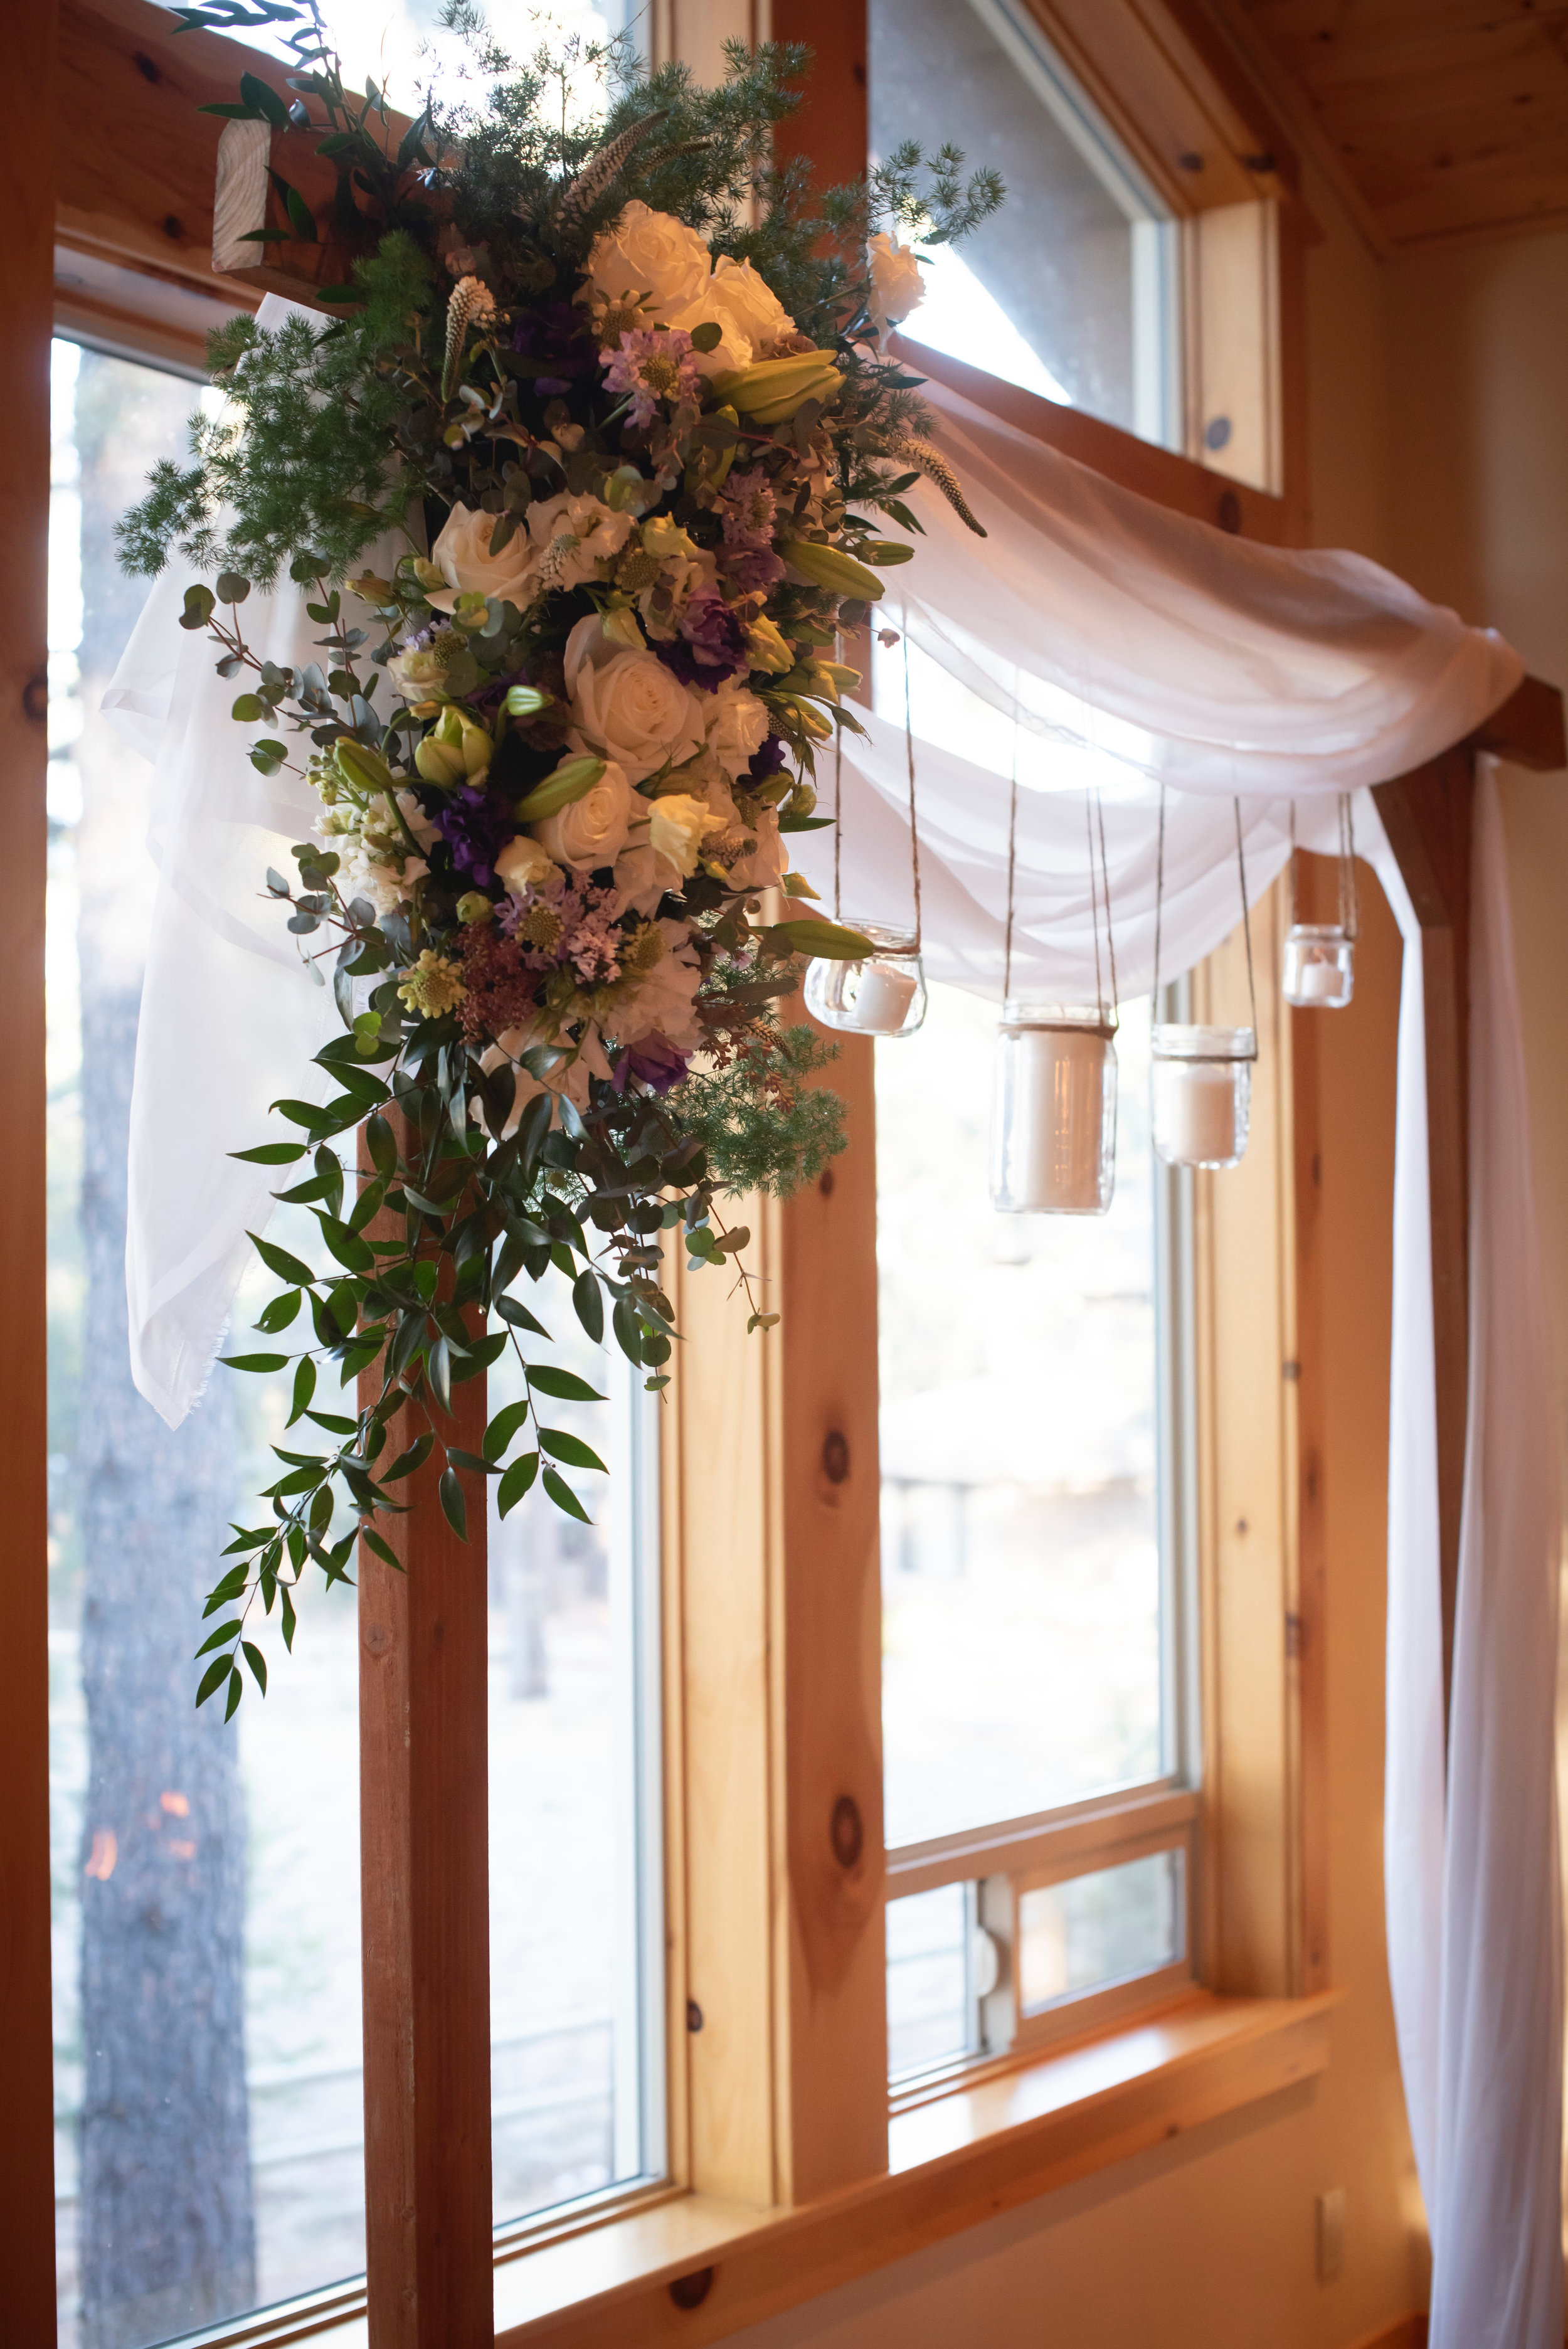 Your Local Bend, Oregon Bespoke Florist.